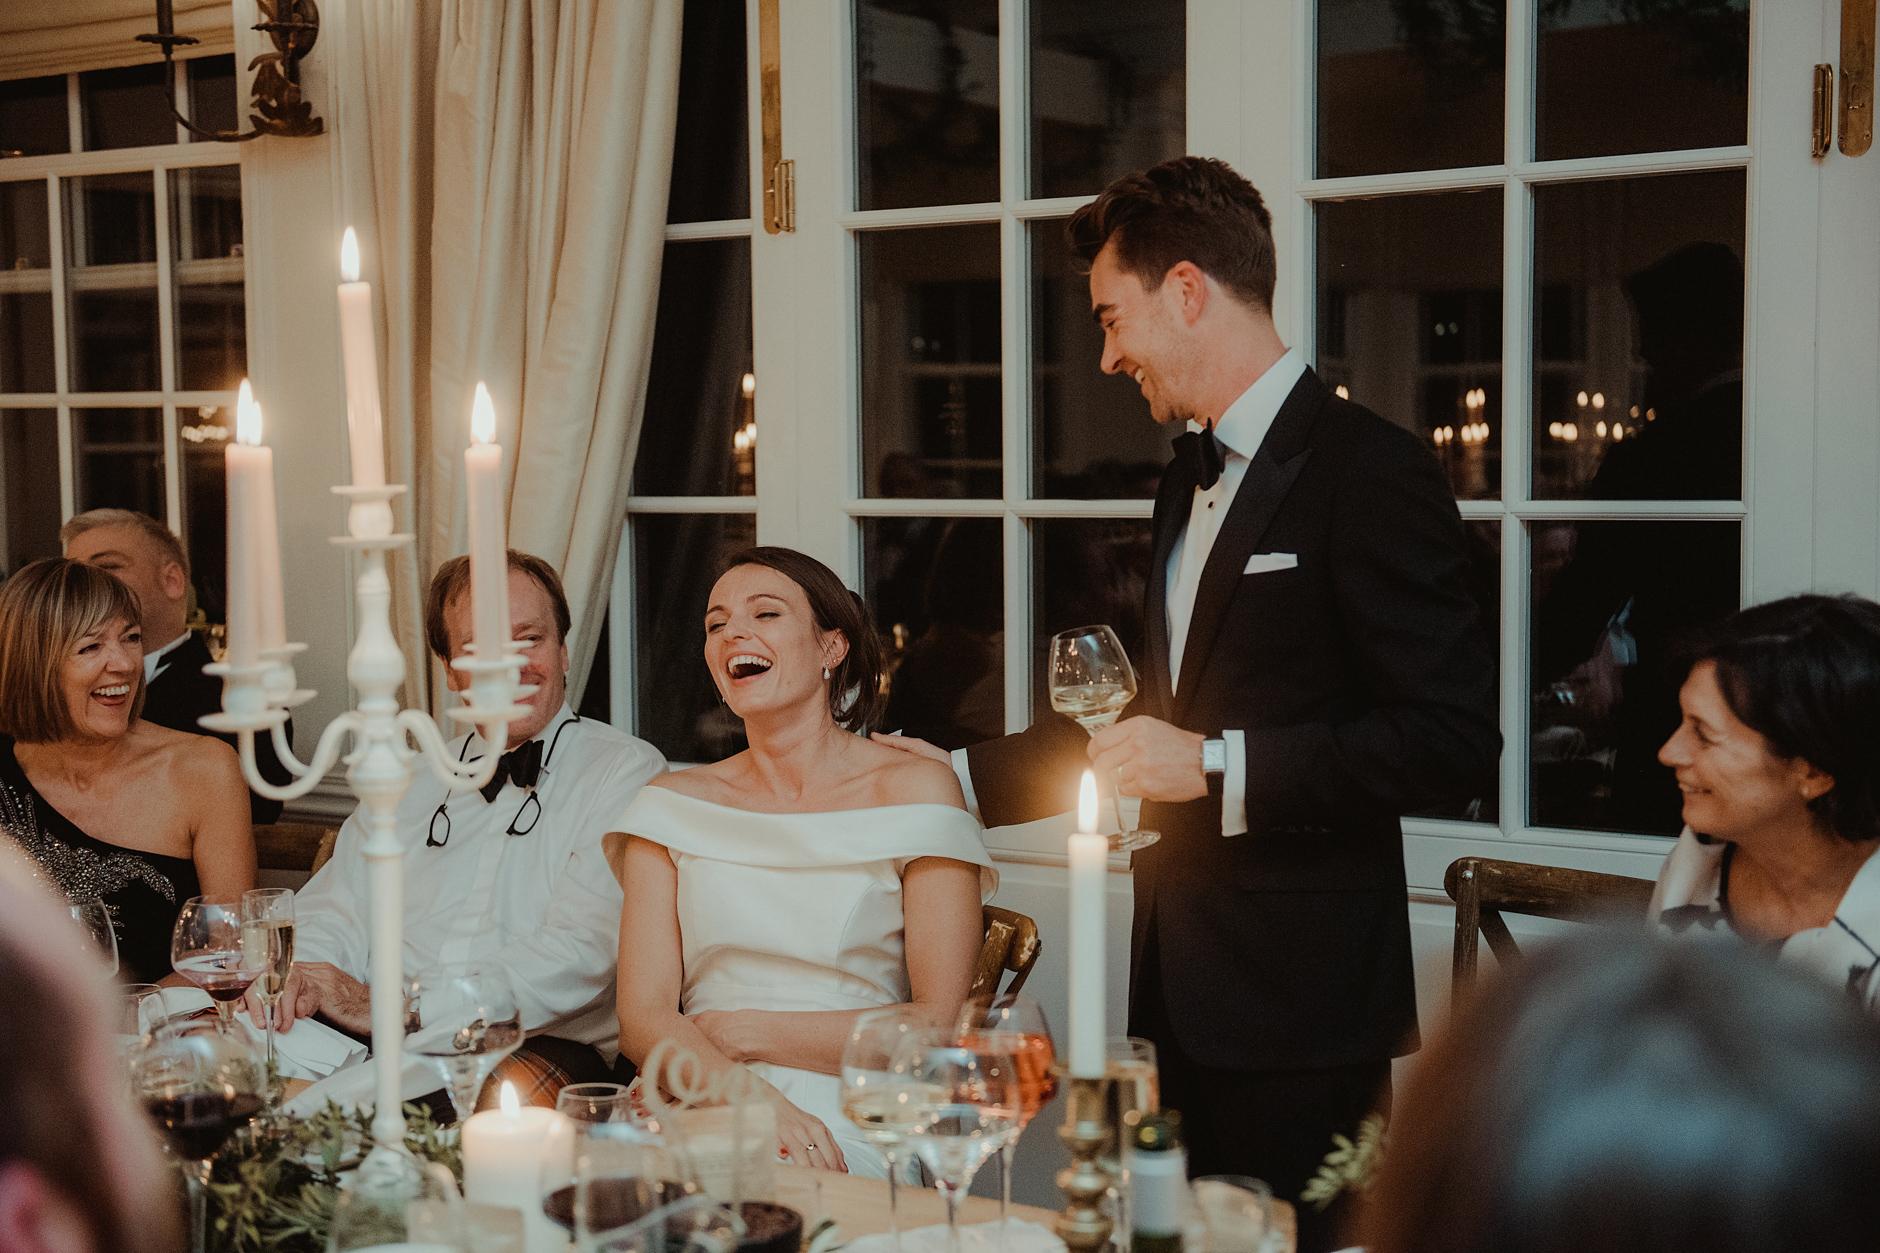 Glentruim-Wedding-Nikki-Leadbetter-Photography-309.jpg